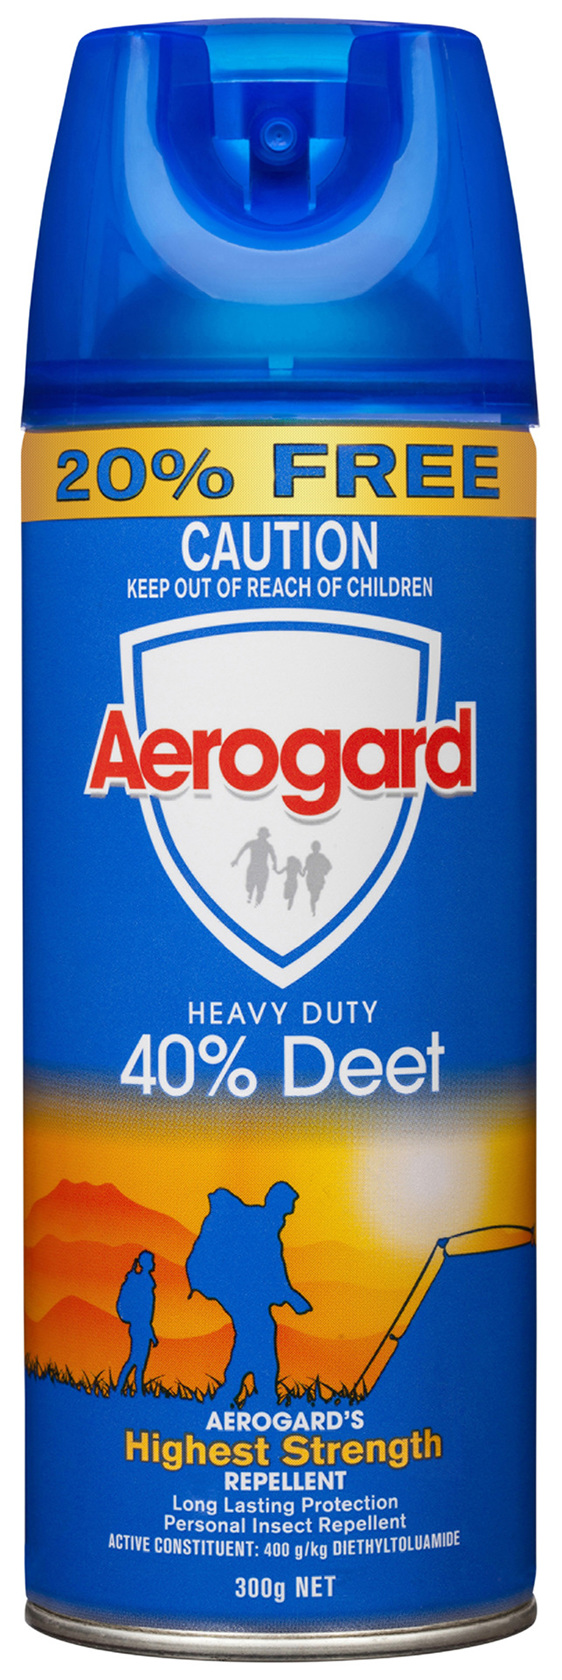 Aerogard Heavy Duty 40% Deet Insect Repellent Aerosol Spray 300g